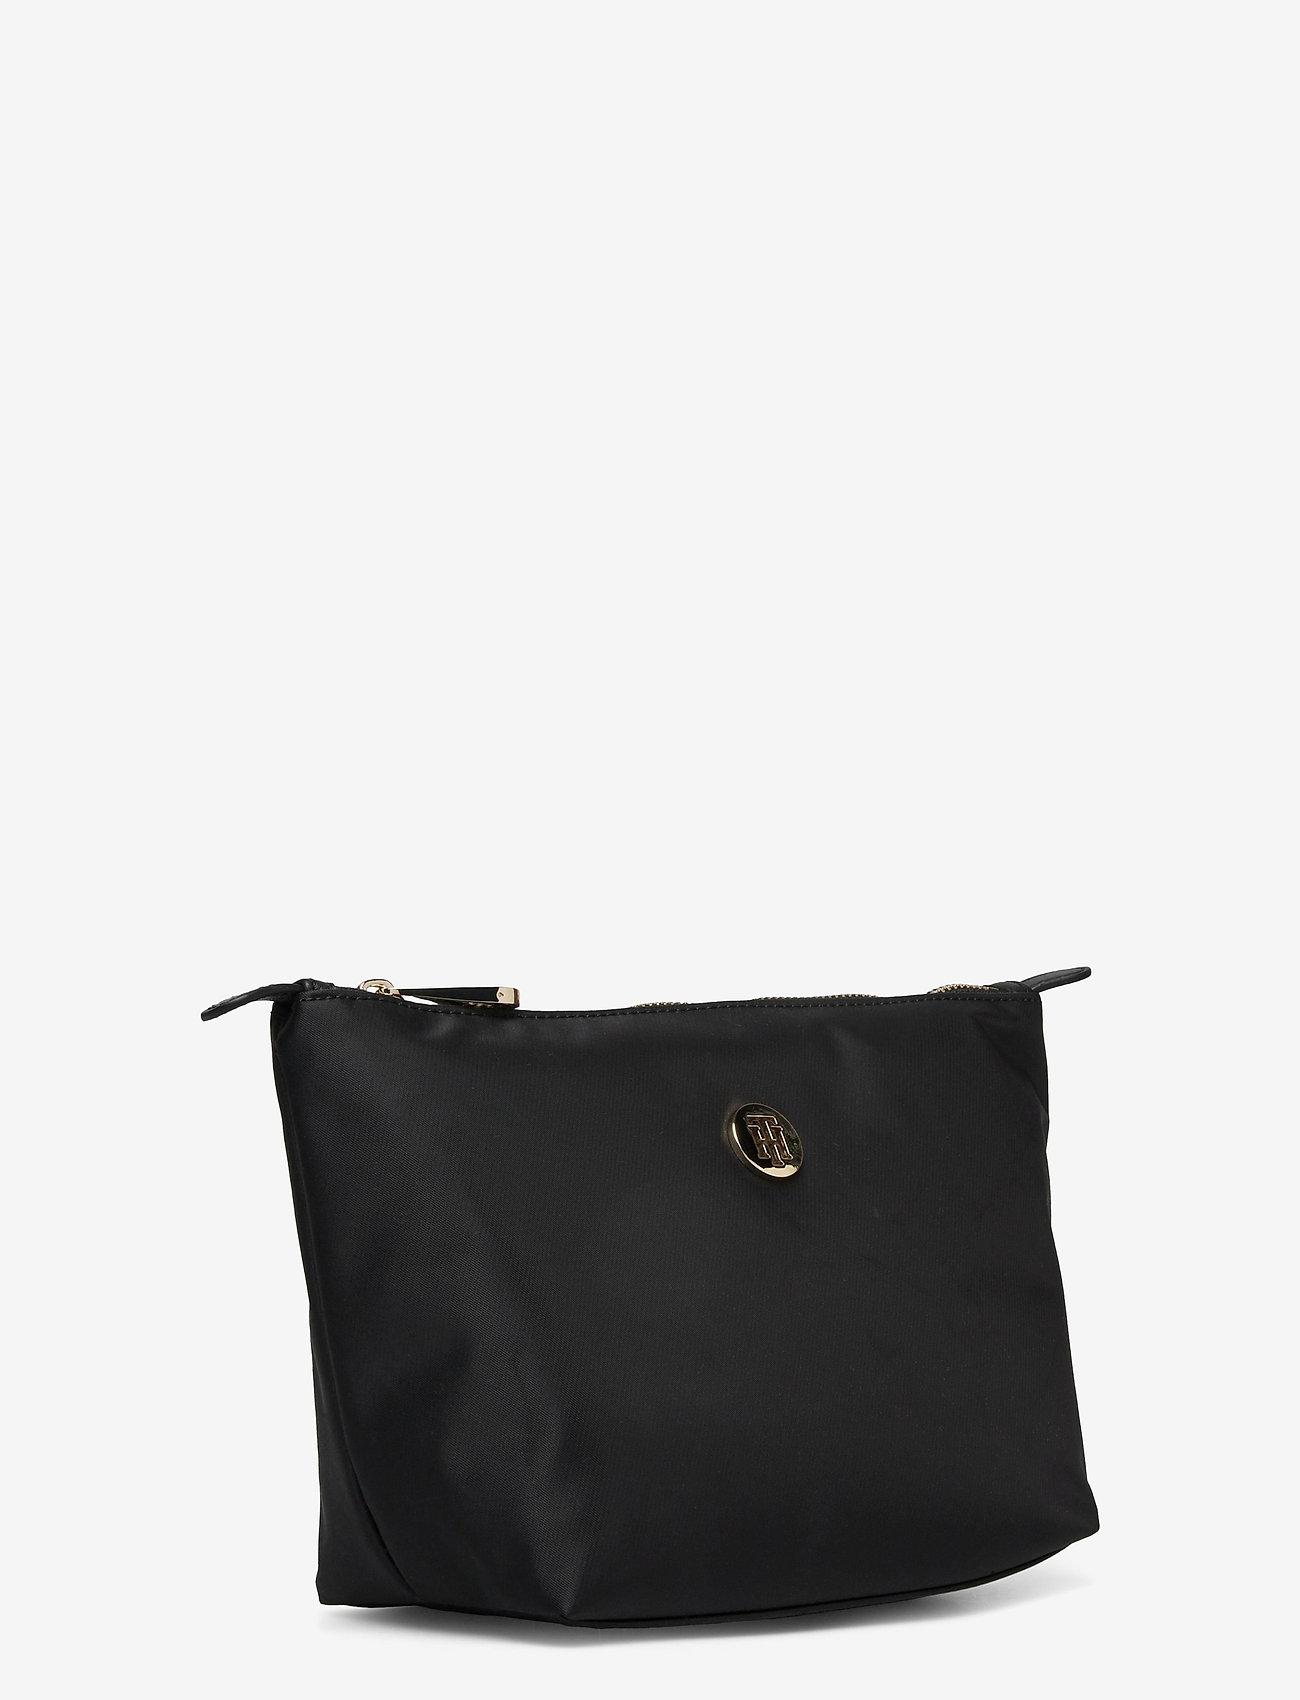 Tommy Hilfiger - POPPY WASHBAG - cosmetic bags - black - 2